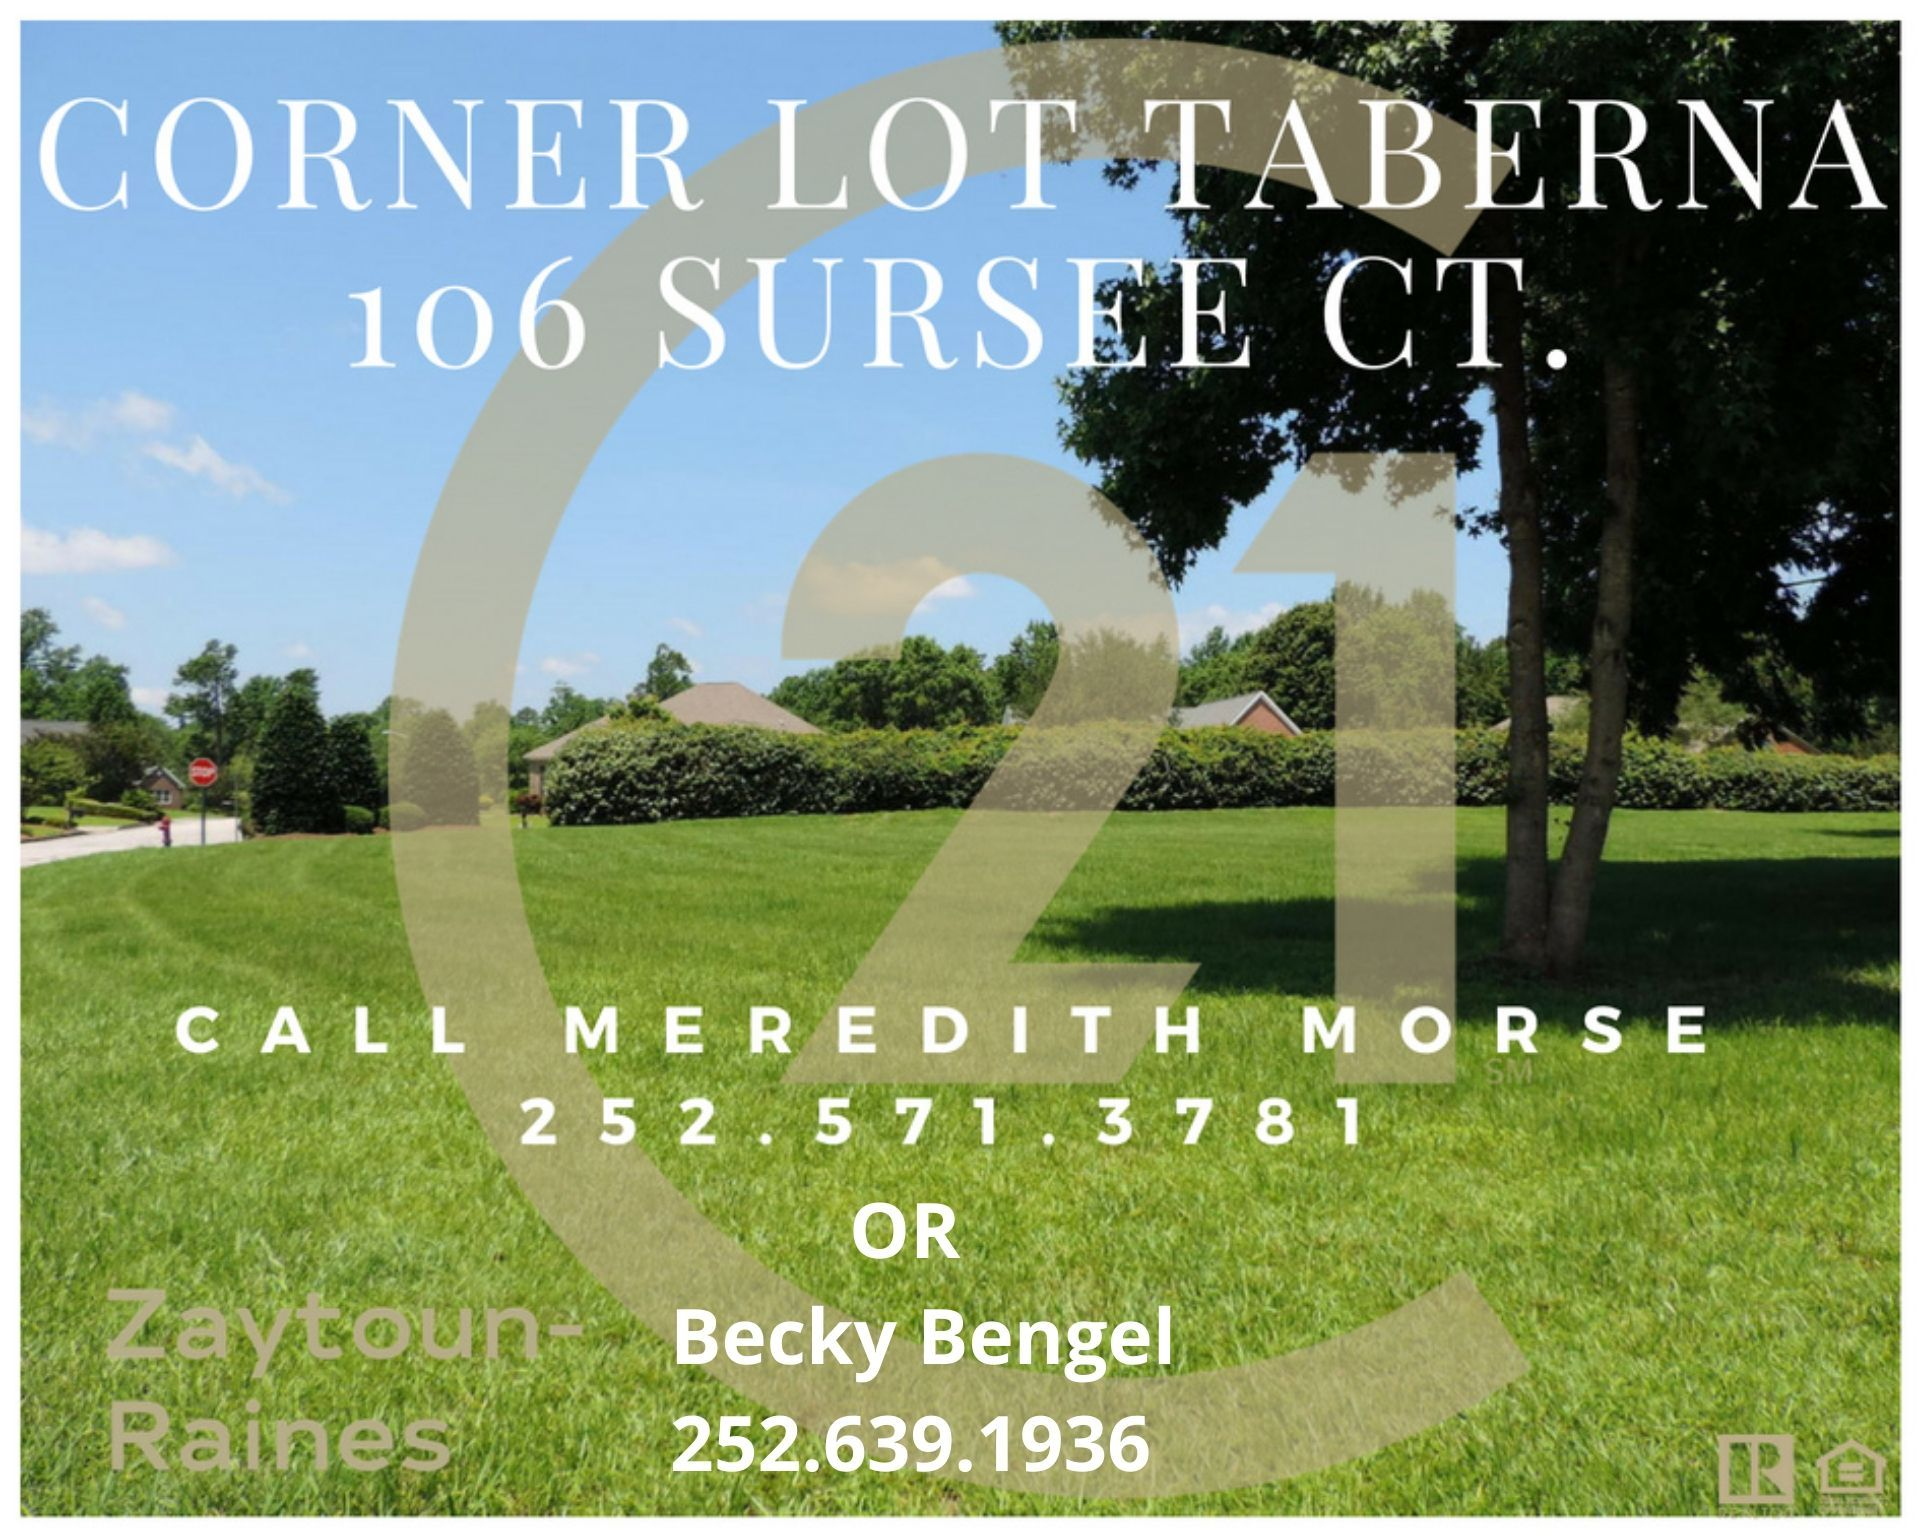 c877ba9717fdb7aa7136e3d5a7535c5d - The Gardens Of Trent New Bern Nc